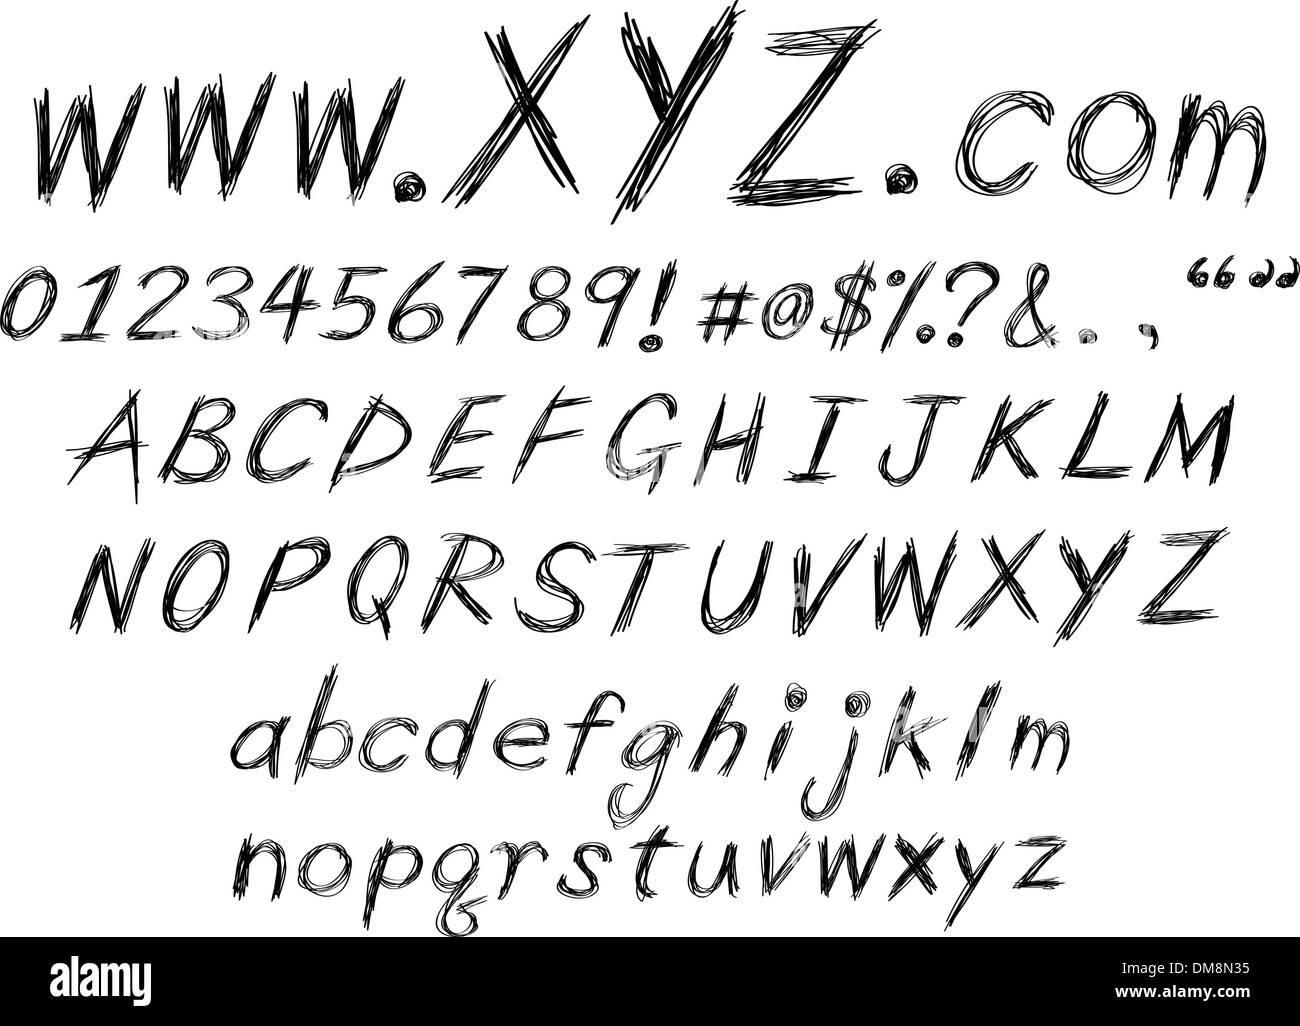 sketch alphabet - Stock Image